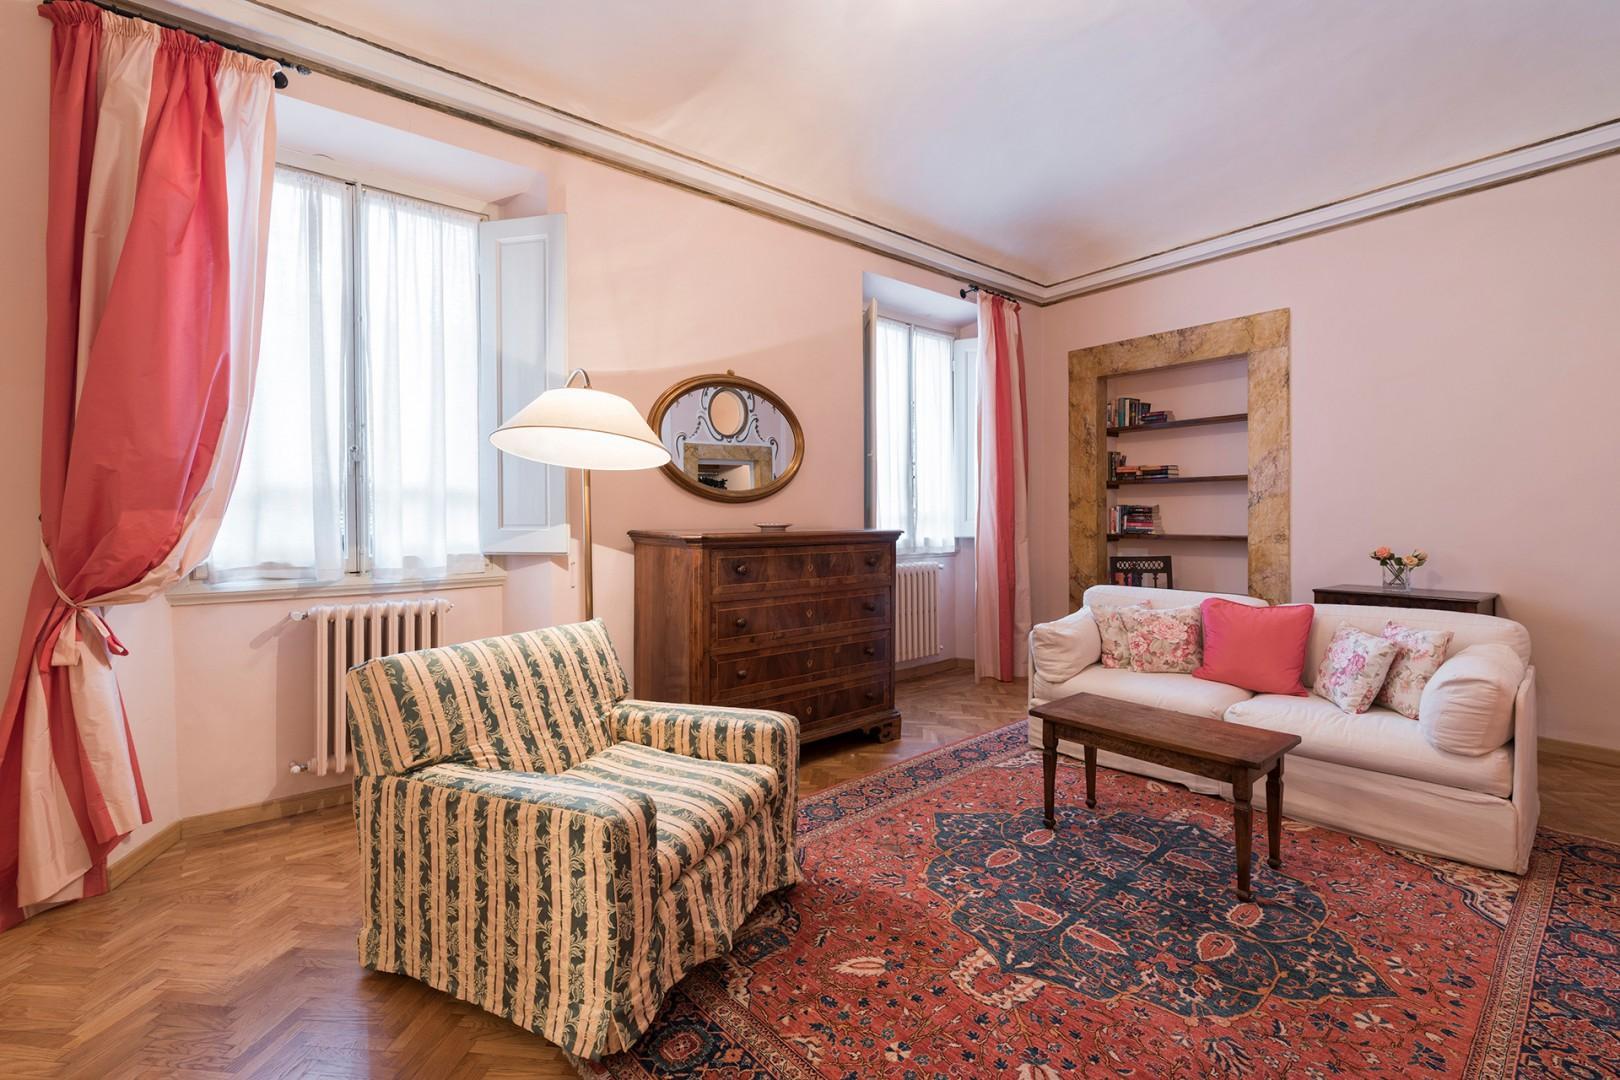 Bedroom 2 has it's own sitting area.